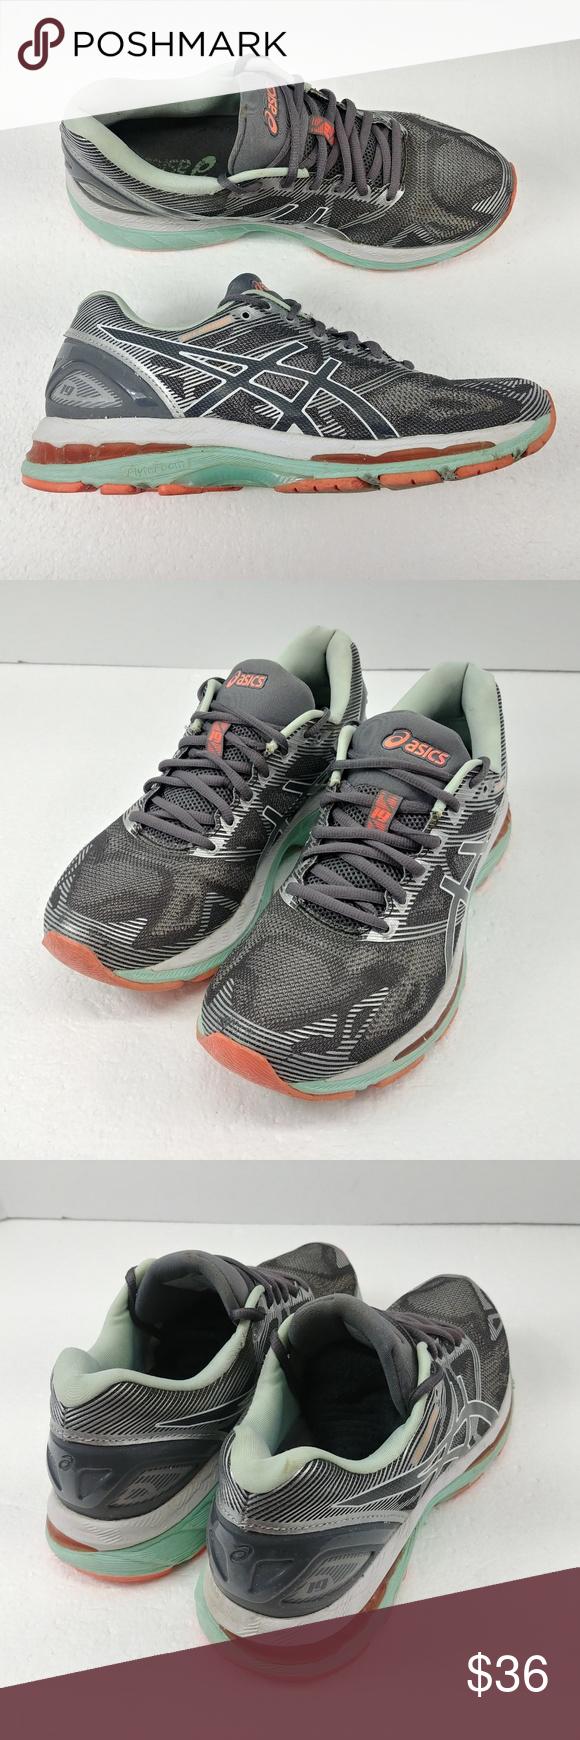 premium selection a5dc7 e93cd Asics Gel Nimbus 19 Running Shoes Gray White T750N Asics Gel ...